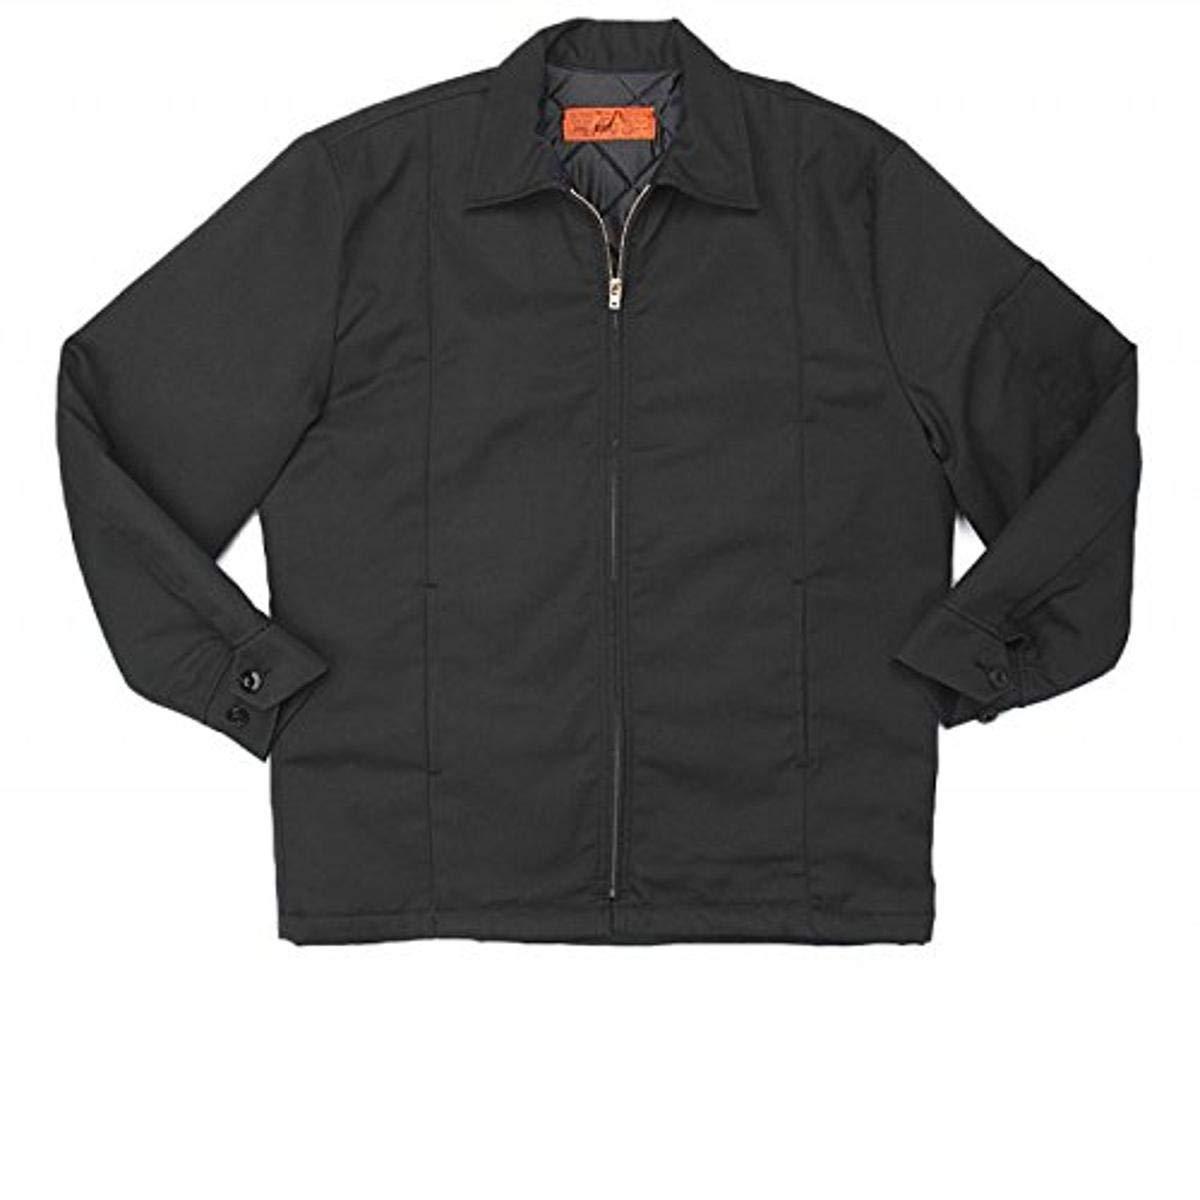 Pinnacle Textile JL14 7.5 OZ Twill, 65/35 Polyester/Cotton, Panel Jacket-X-Large-Black